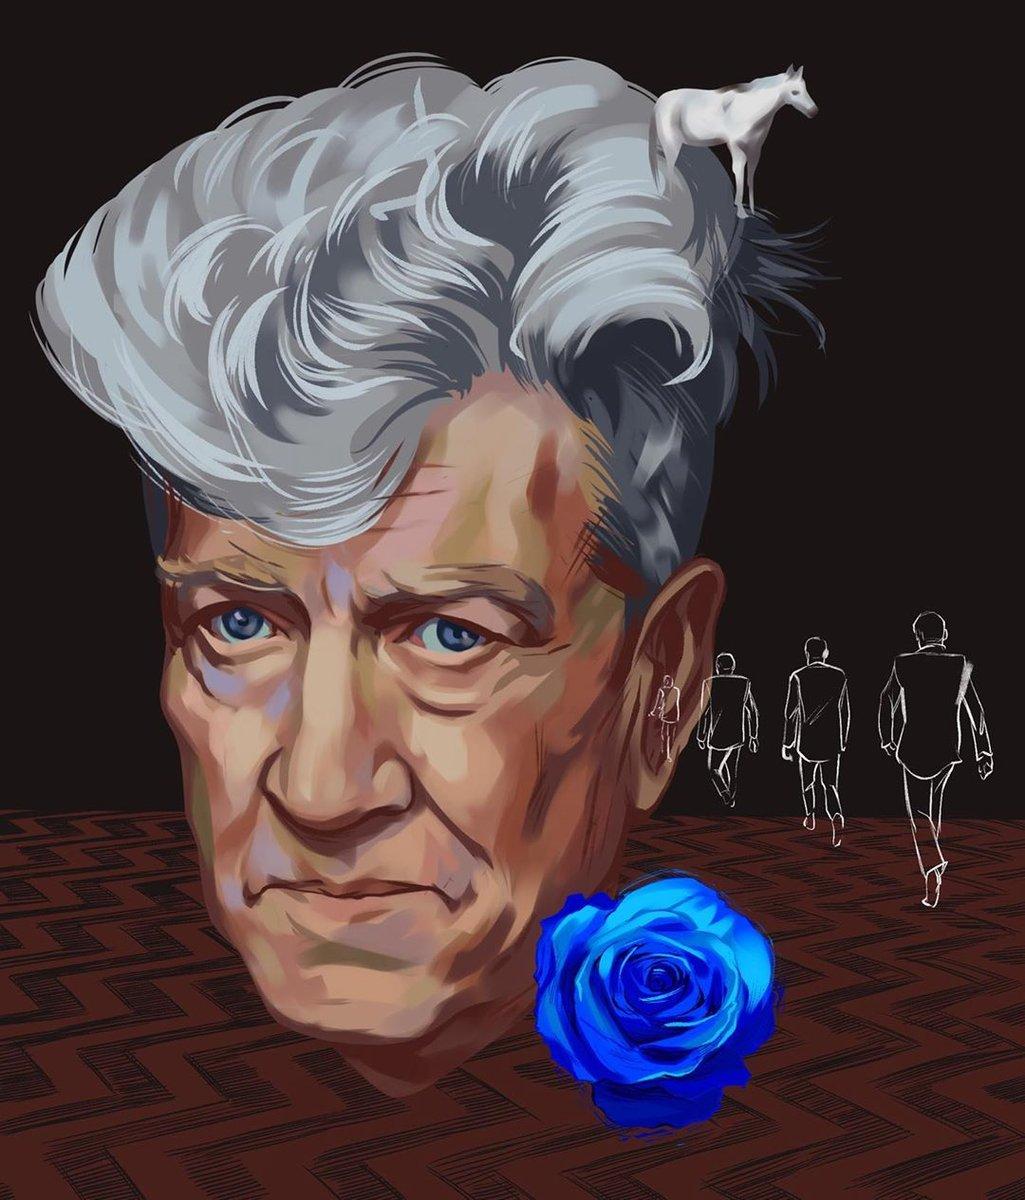 David Lynch art by Kozi Kozłowska @kozikozikoz  . . . #davidlynch #twinpeaks #art #instalike #photography #picoftheday #photooftheday #amazing #pretty #love #cine #cinema #film #films #serie #tvserie #tvseries #davidlynchart #twinpeaksart #fanart #drawing https://t.co/Cp1N3QlBJz